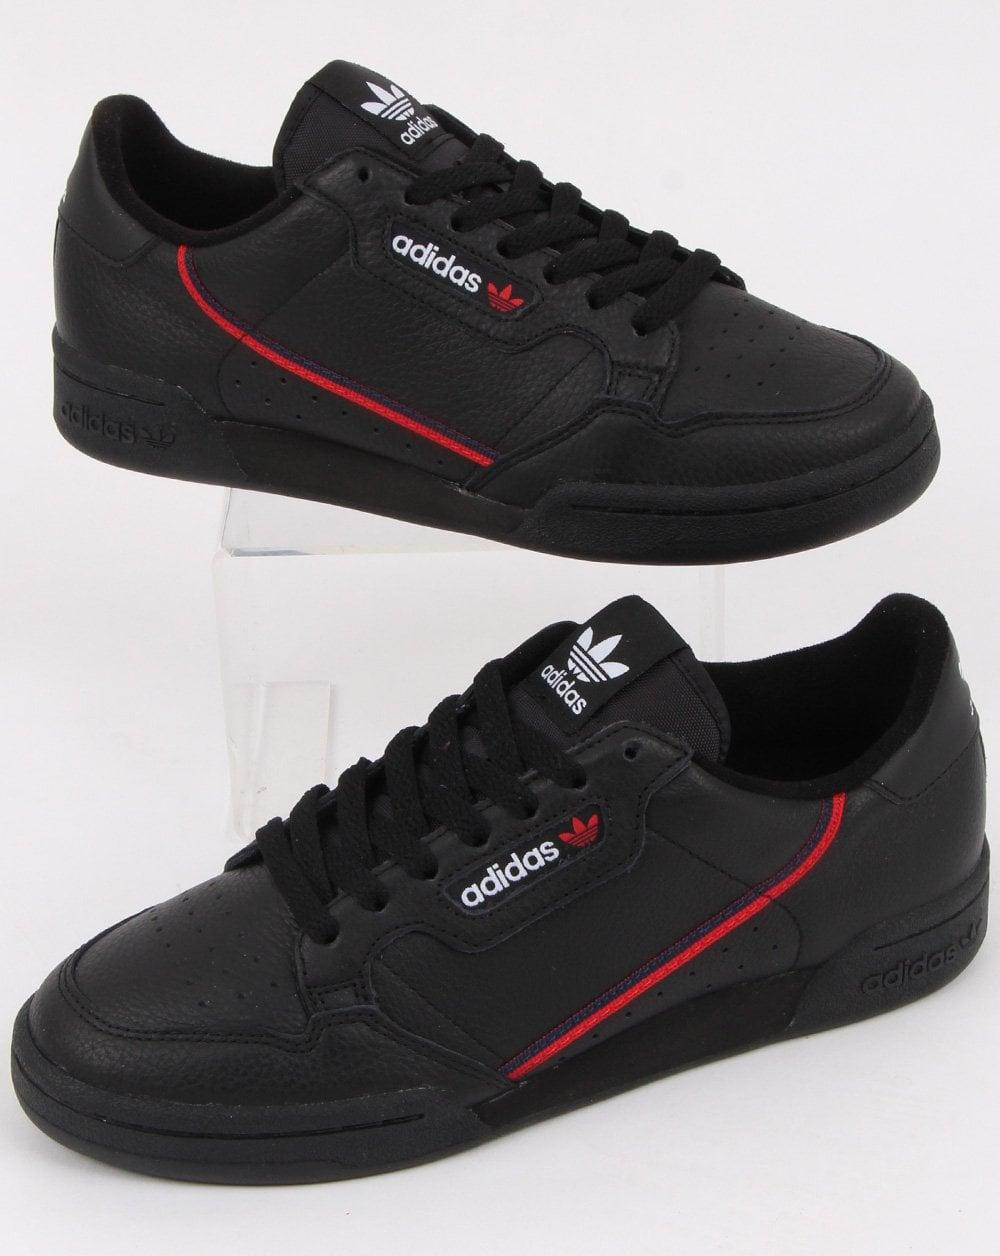 a94085dda4e3 adidas Trainers Adidas Continental 80 Trainers Black scarlet navy